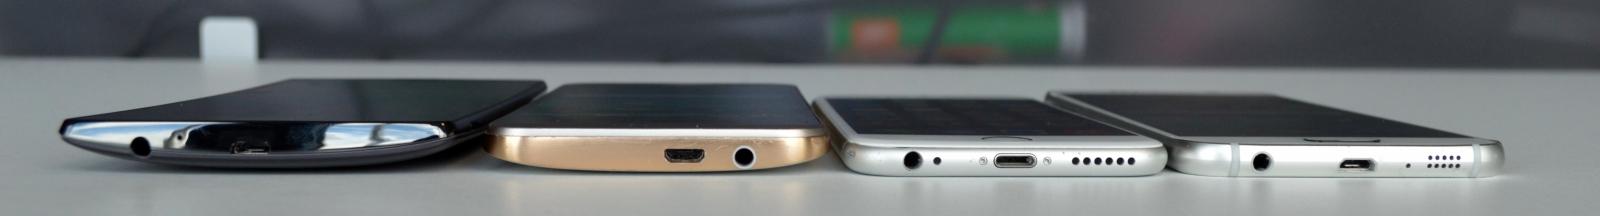 iPhone 6 Galaxy S6 One M9 G4